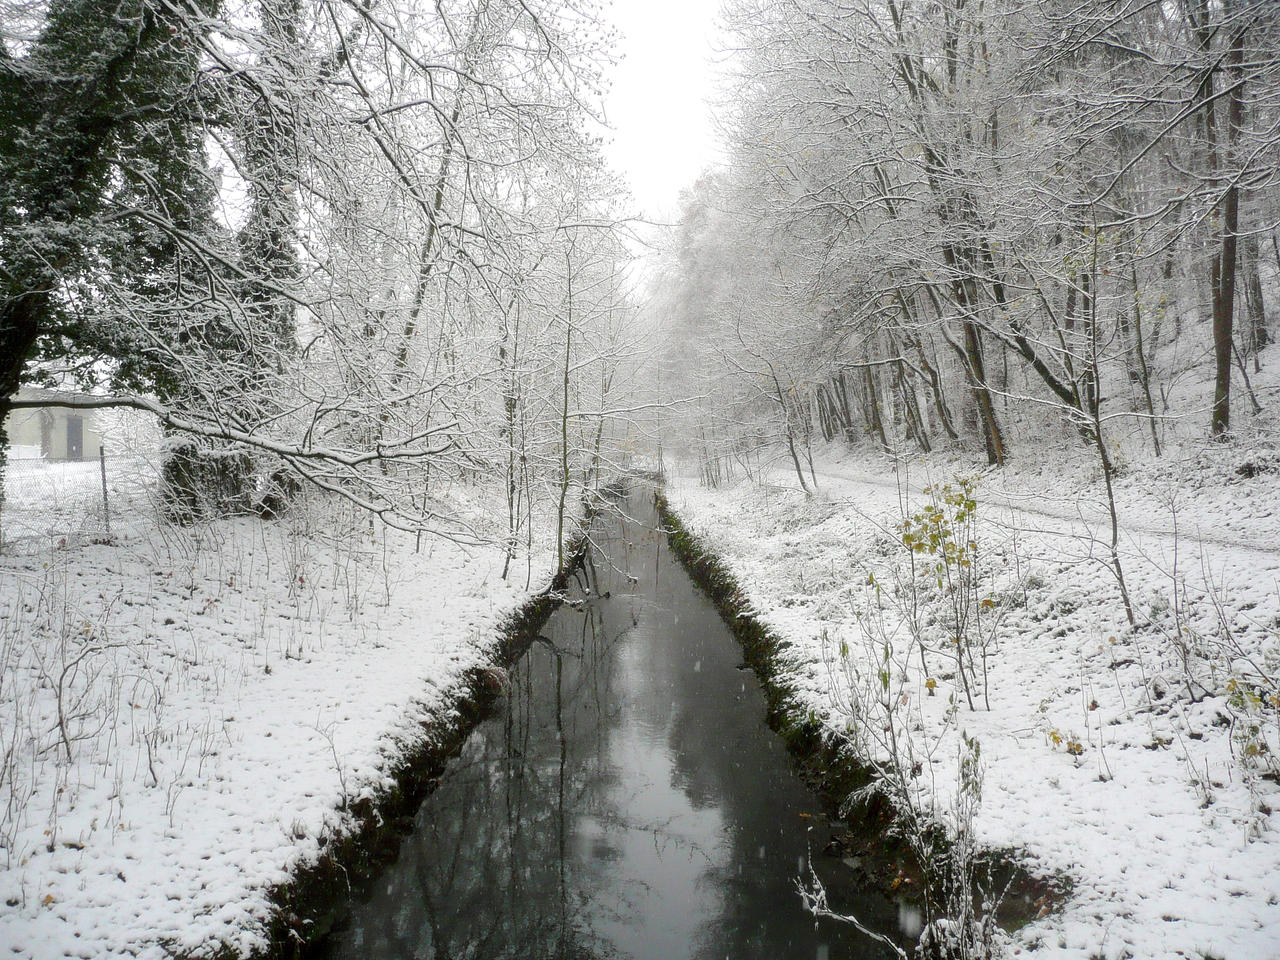 Snowy River by roman2